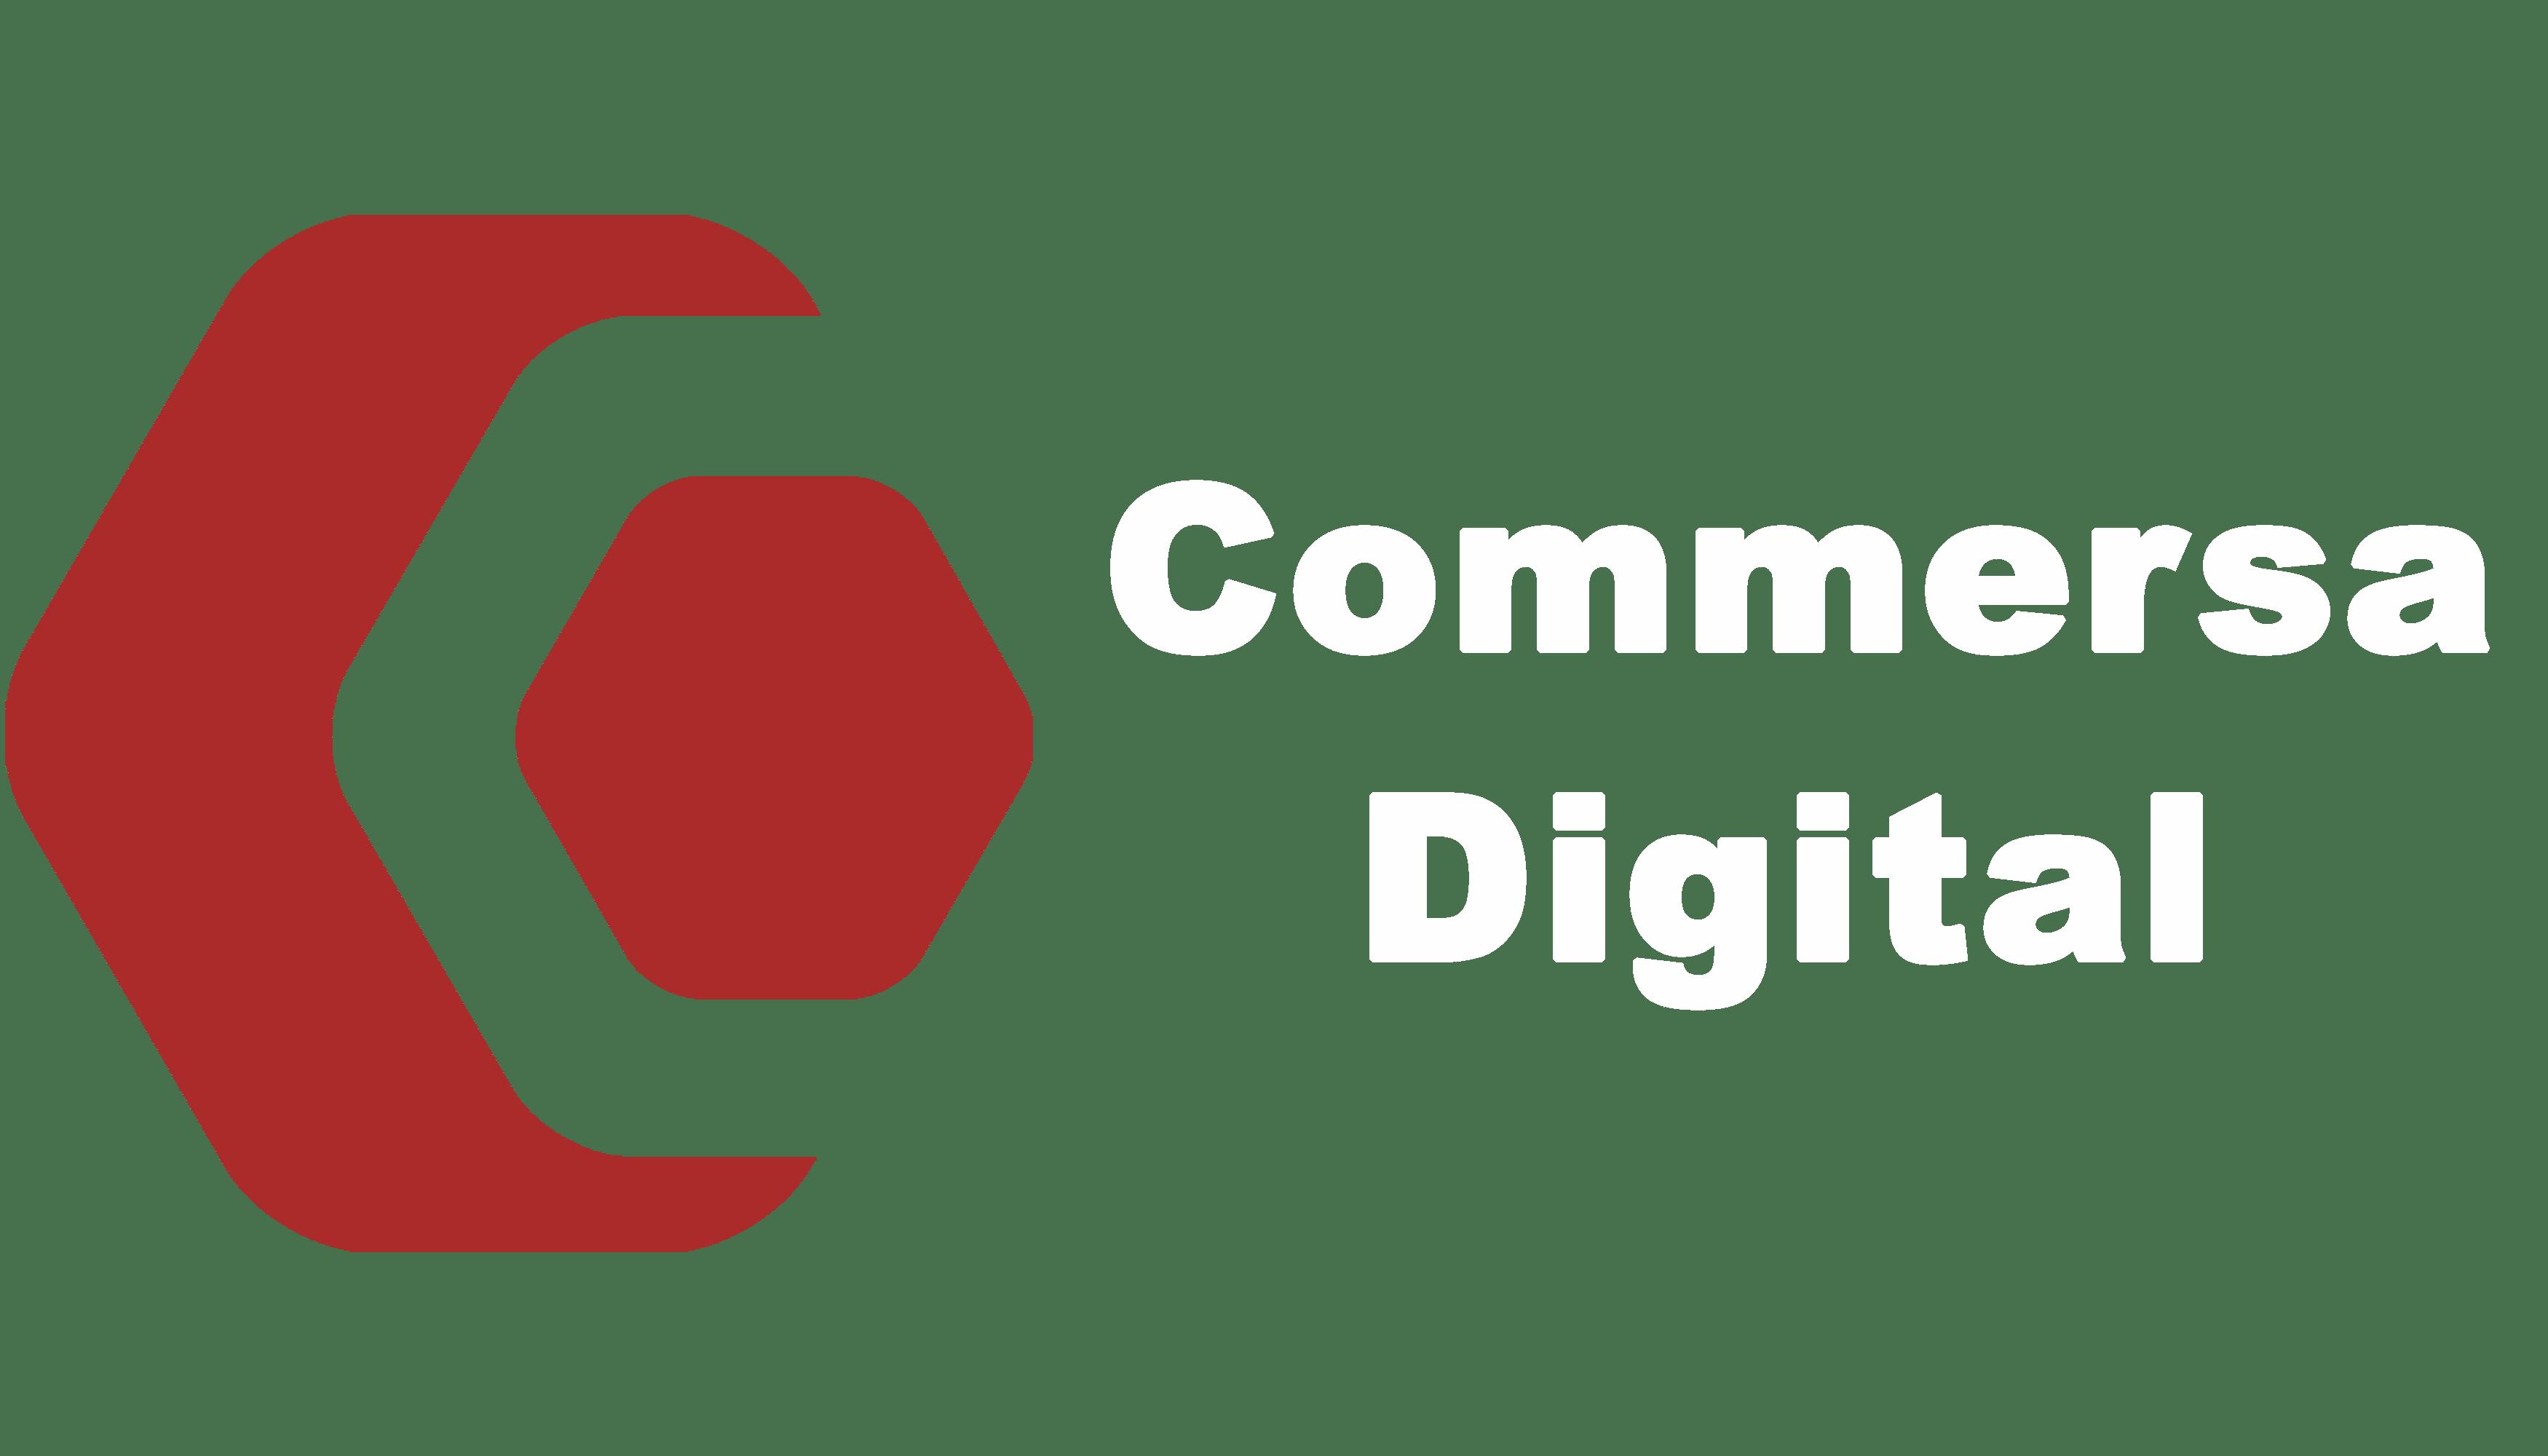 Commersa Digital